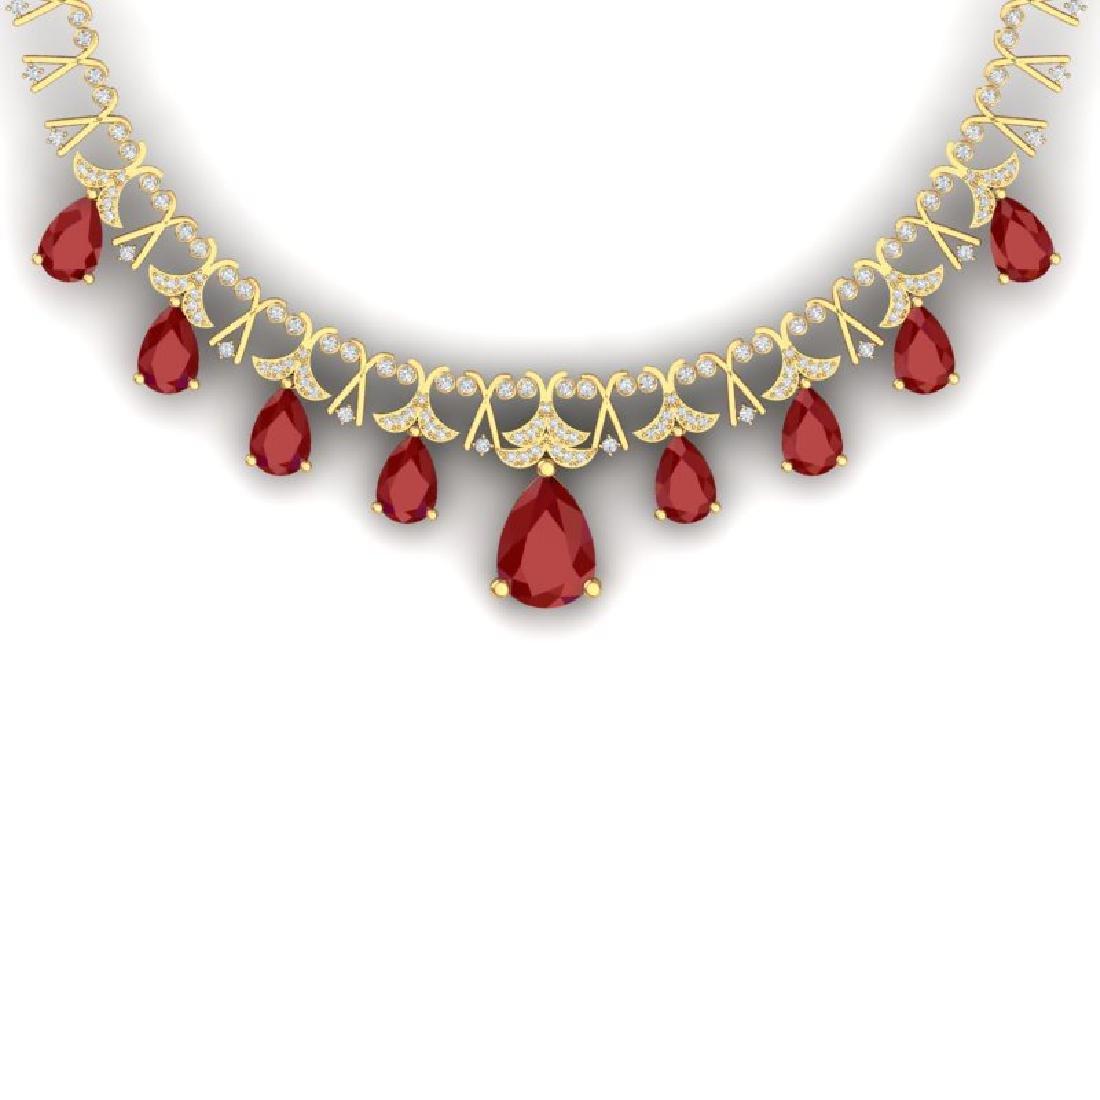 56.94 CTW Royalty Ruby & VS Diamond Necklace 18K Yellow